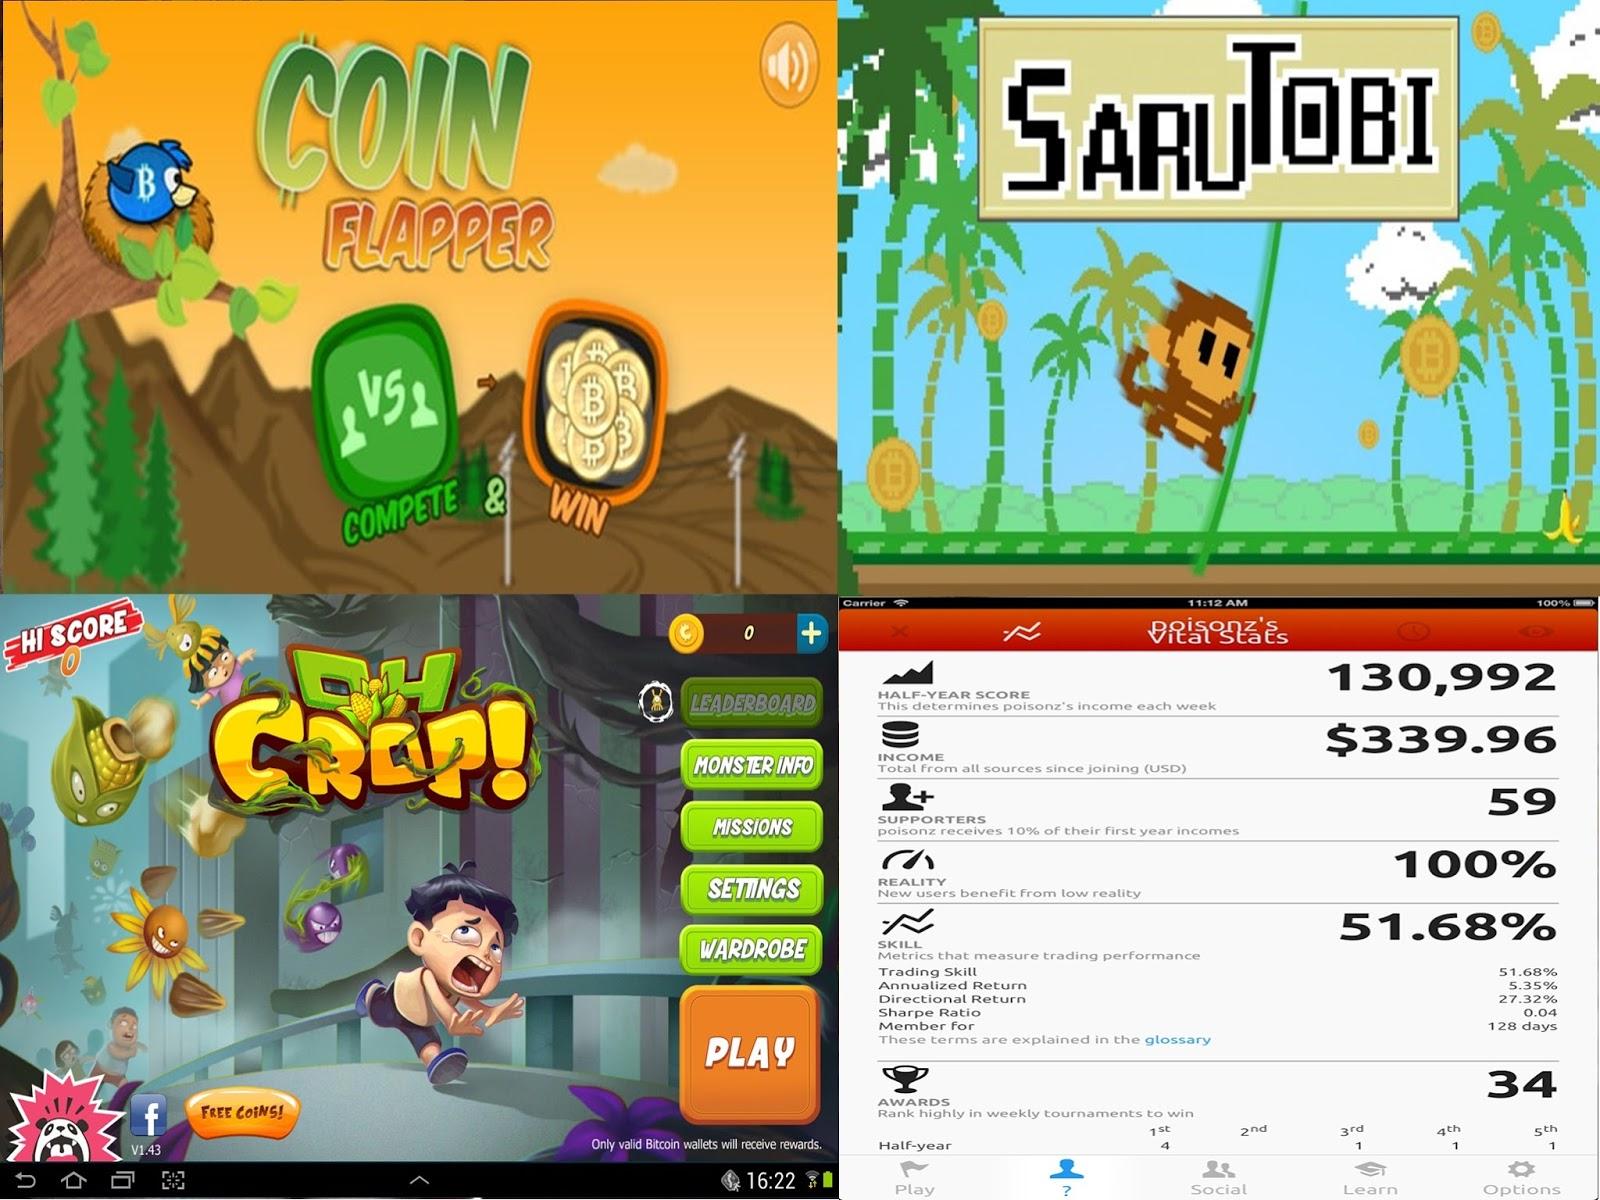 Bitcoin Games Top No Deposit Bitcoin Games You Can Earn Btc From